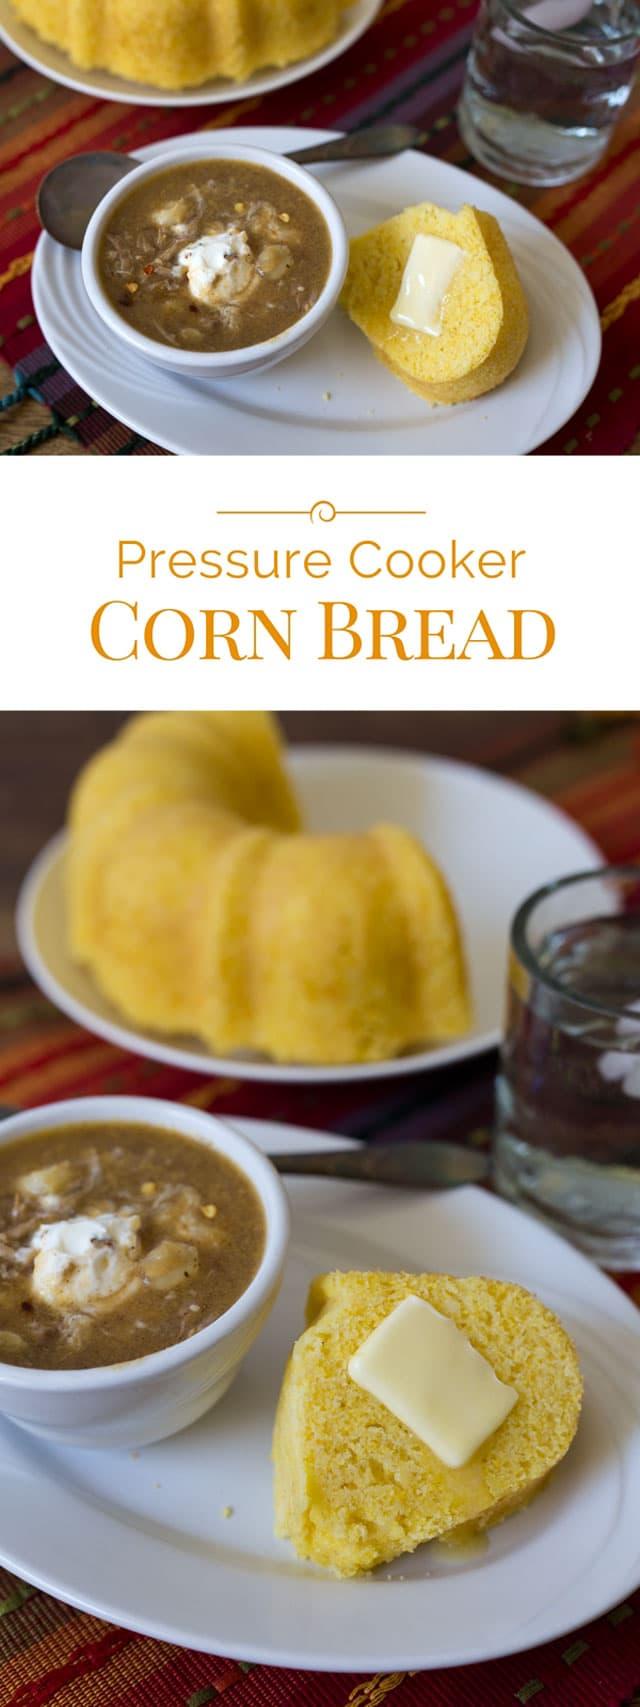 titled photo collage - Pressure Cooker Corn Bread